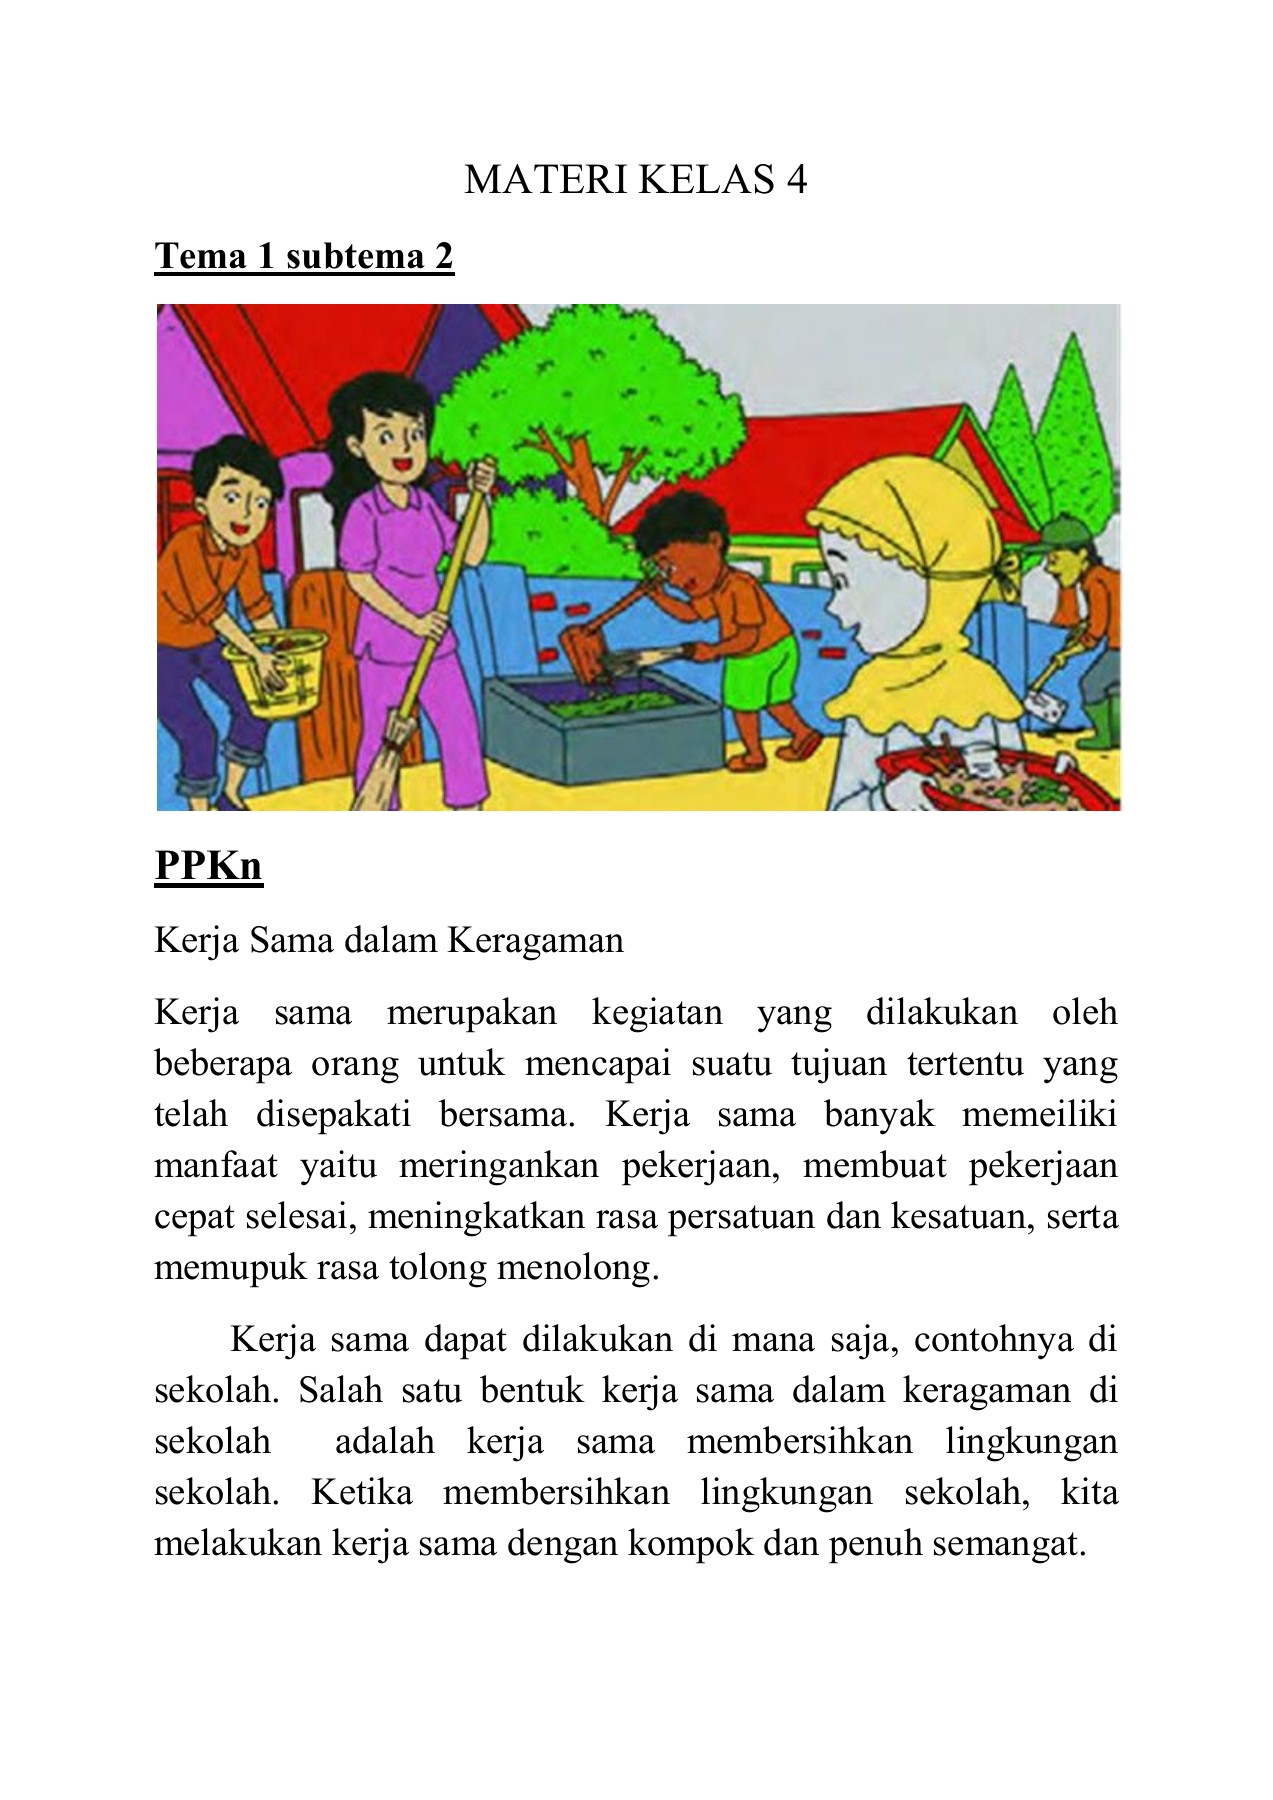 Materi Kelas 4 Sub Tema 2 Ppkn Sbdp Flip Book Pages 1 4 Pubhtml5